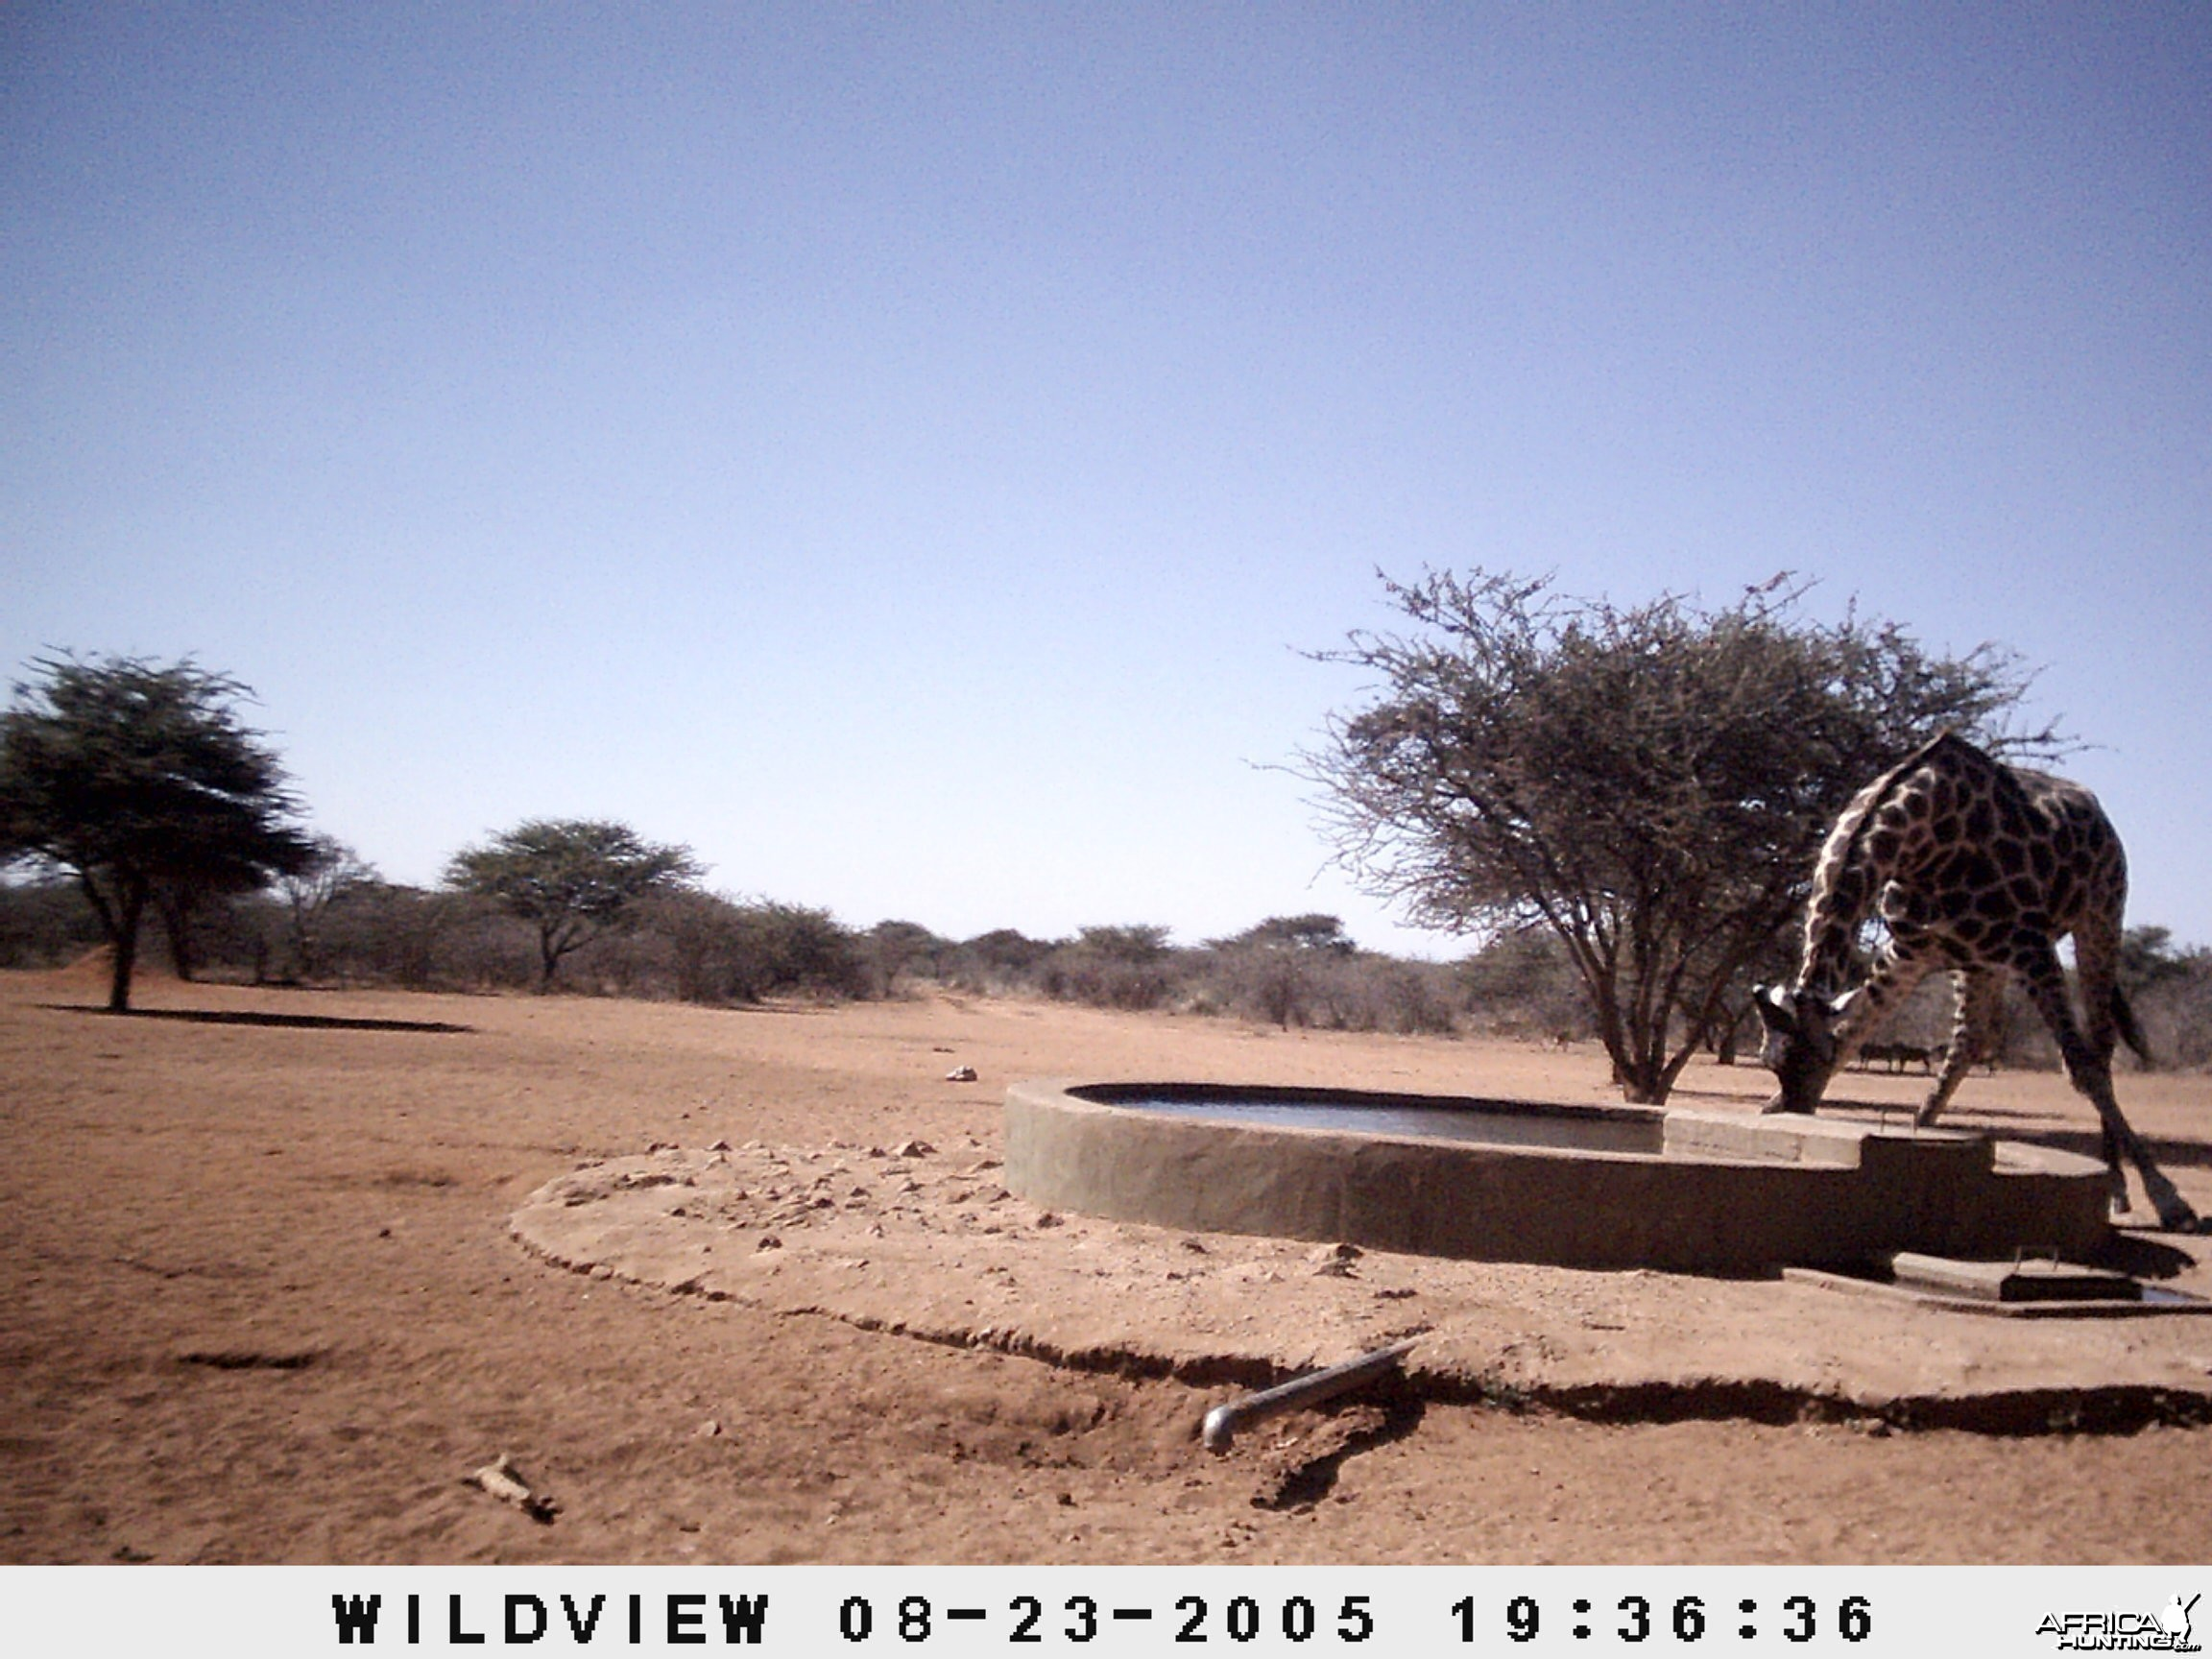 Giraffes and Warthogs, Namibia